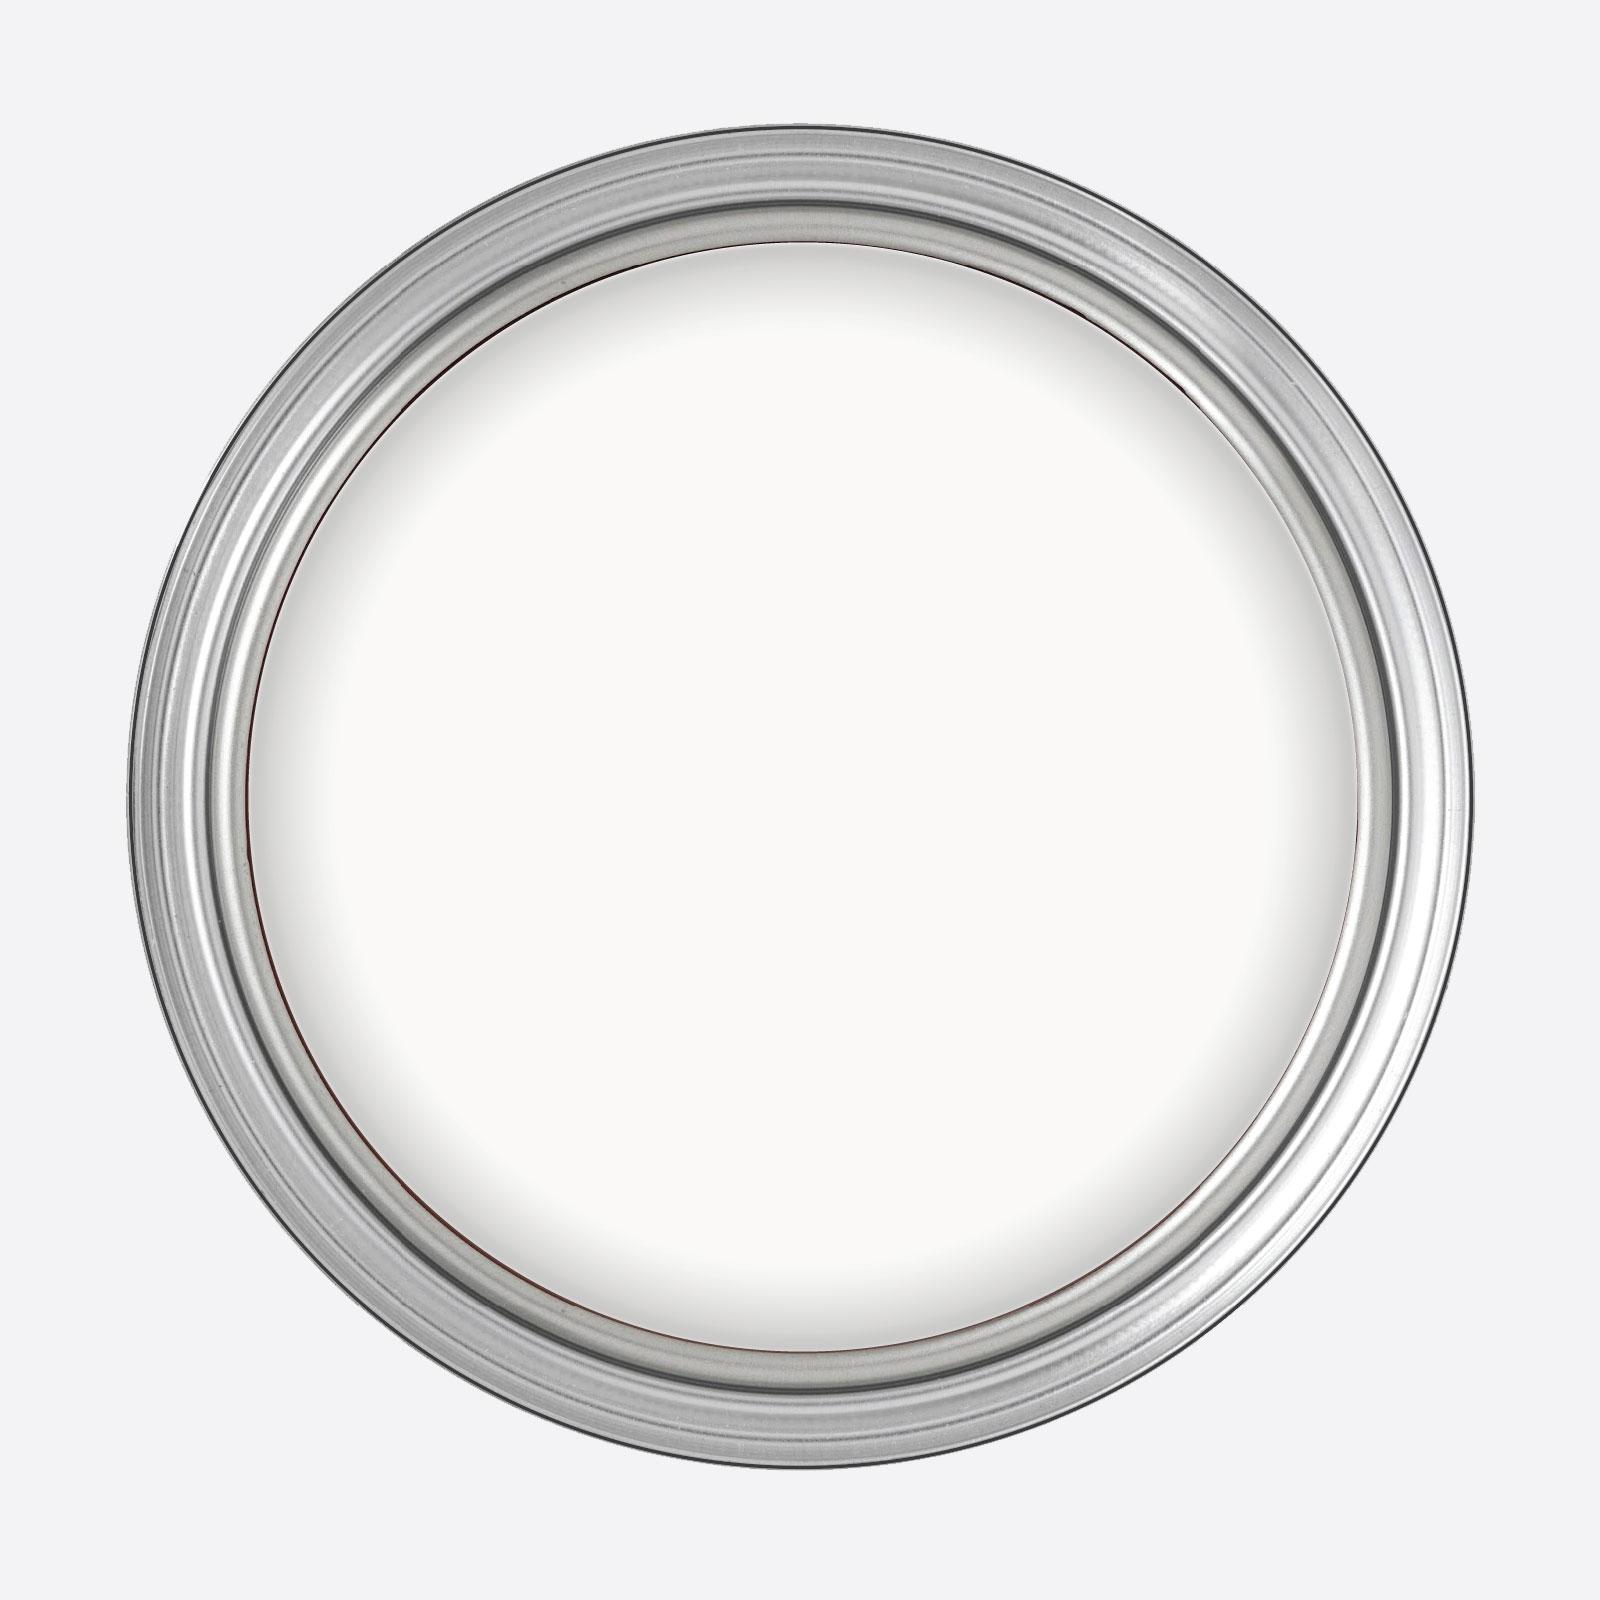 Linoljefärg Grön Umbra 2%. 0.16 L